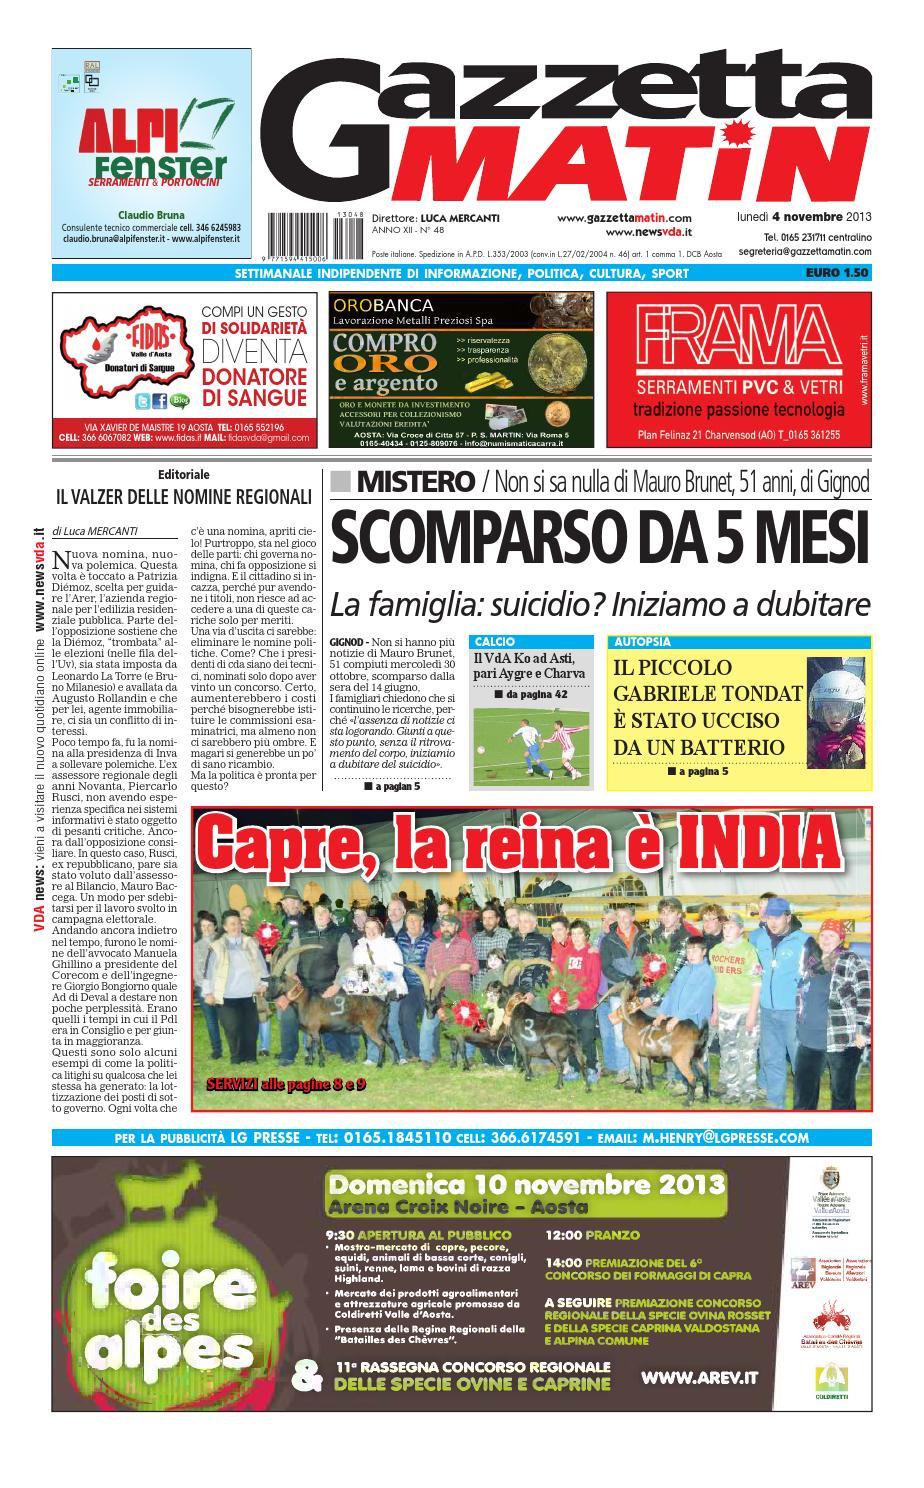 Gazzetta Matin del 04 novembre 2013 by Luca Mercanti - issuu